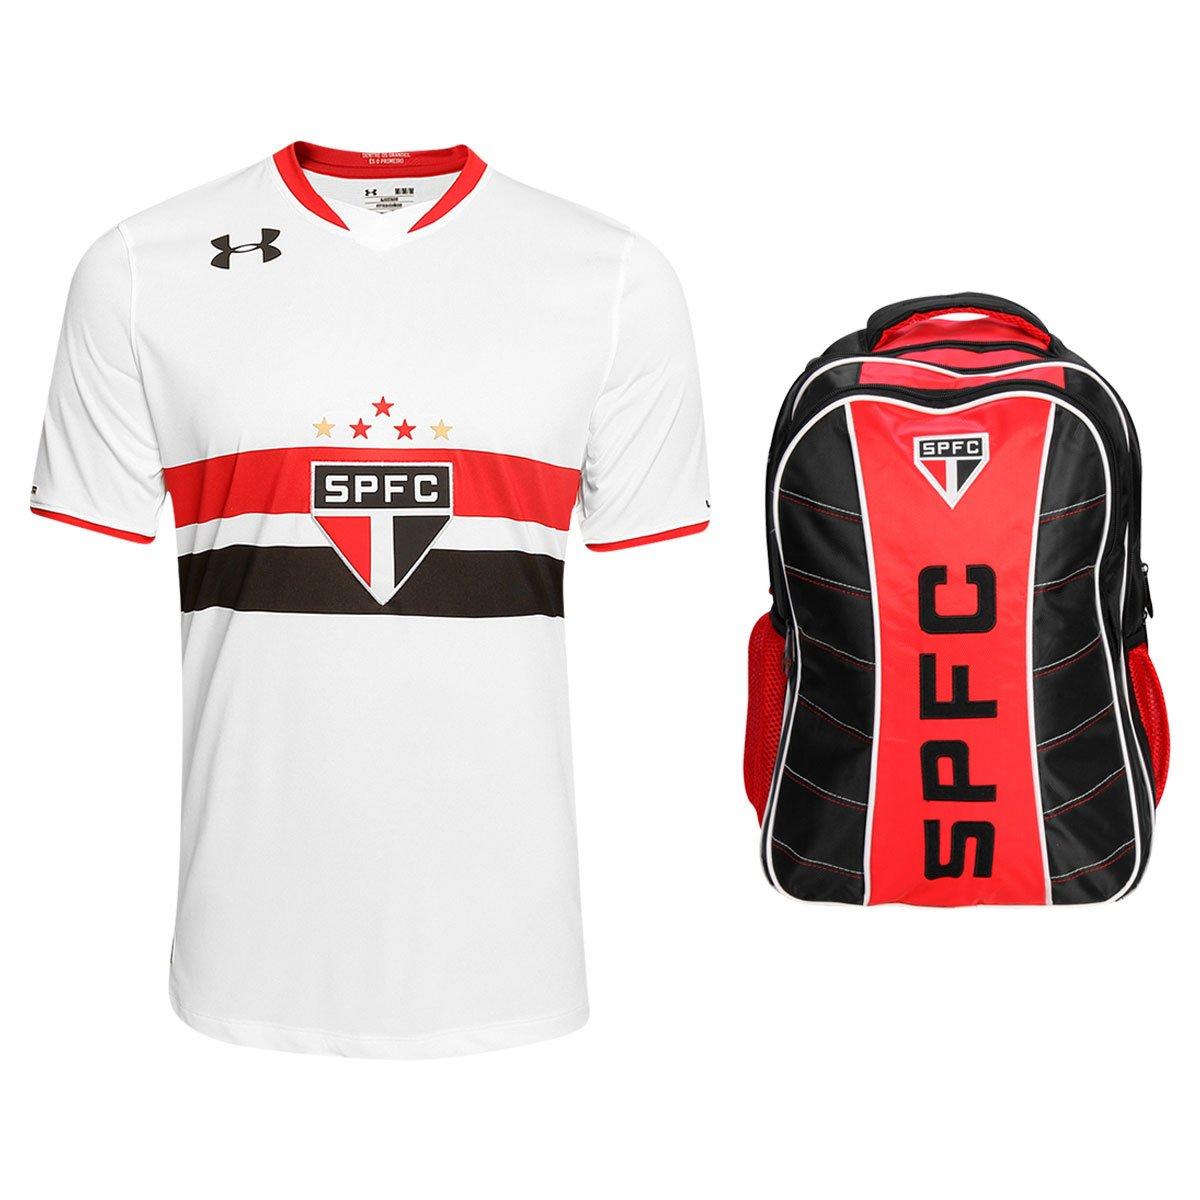 b0cf253f0ccf5 Kit Camisa Under Armour São Paulo I 2015 s n° + Mochila São Paulo